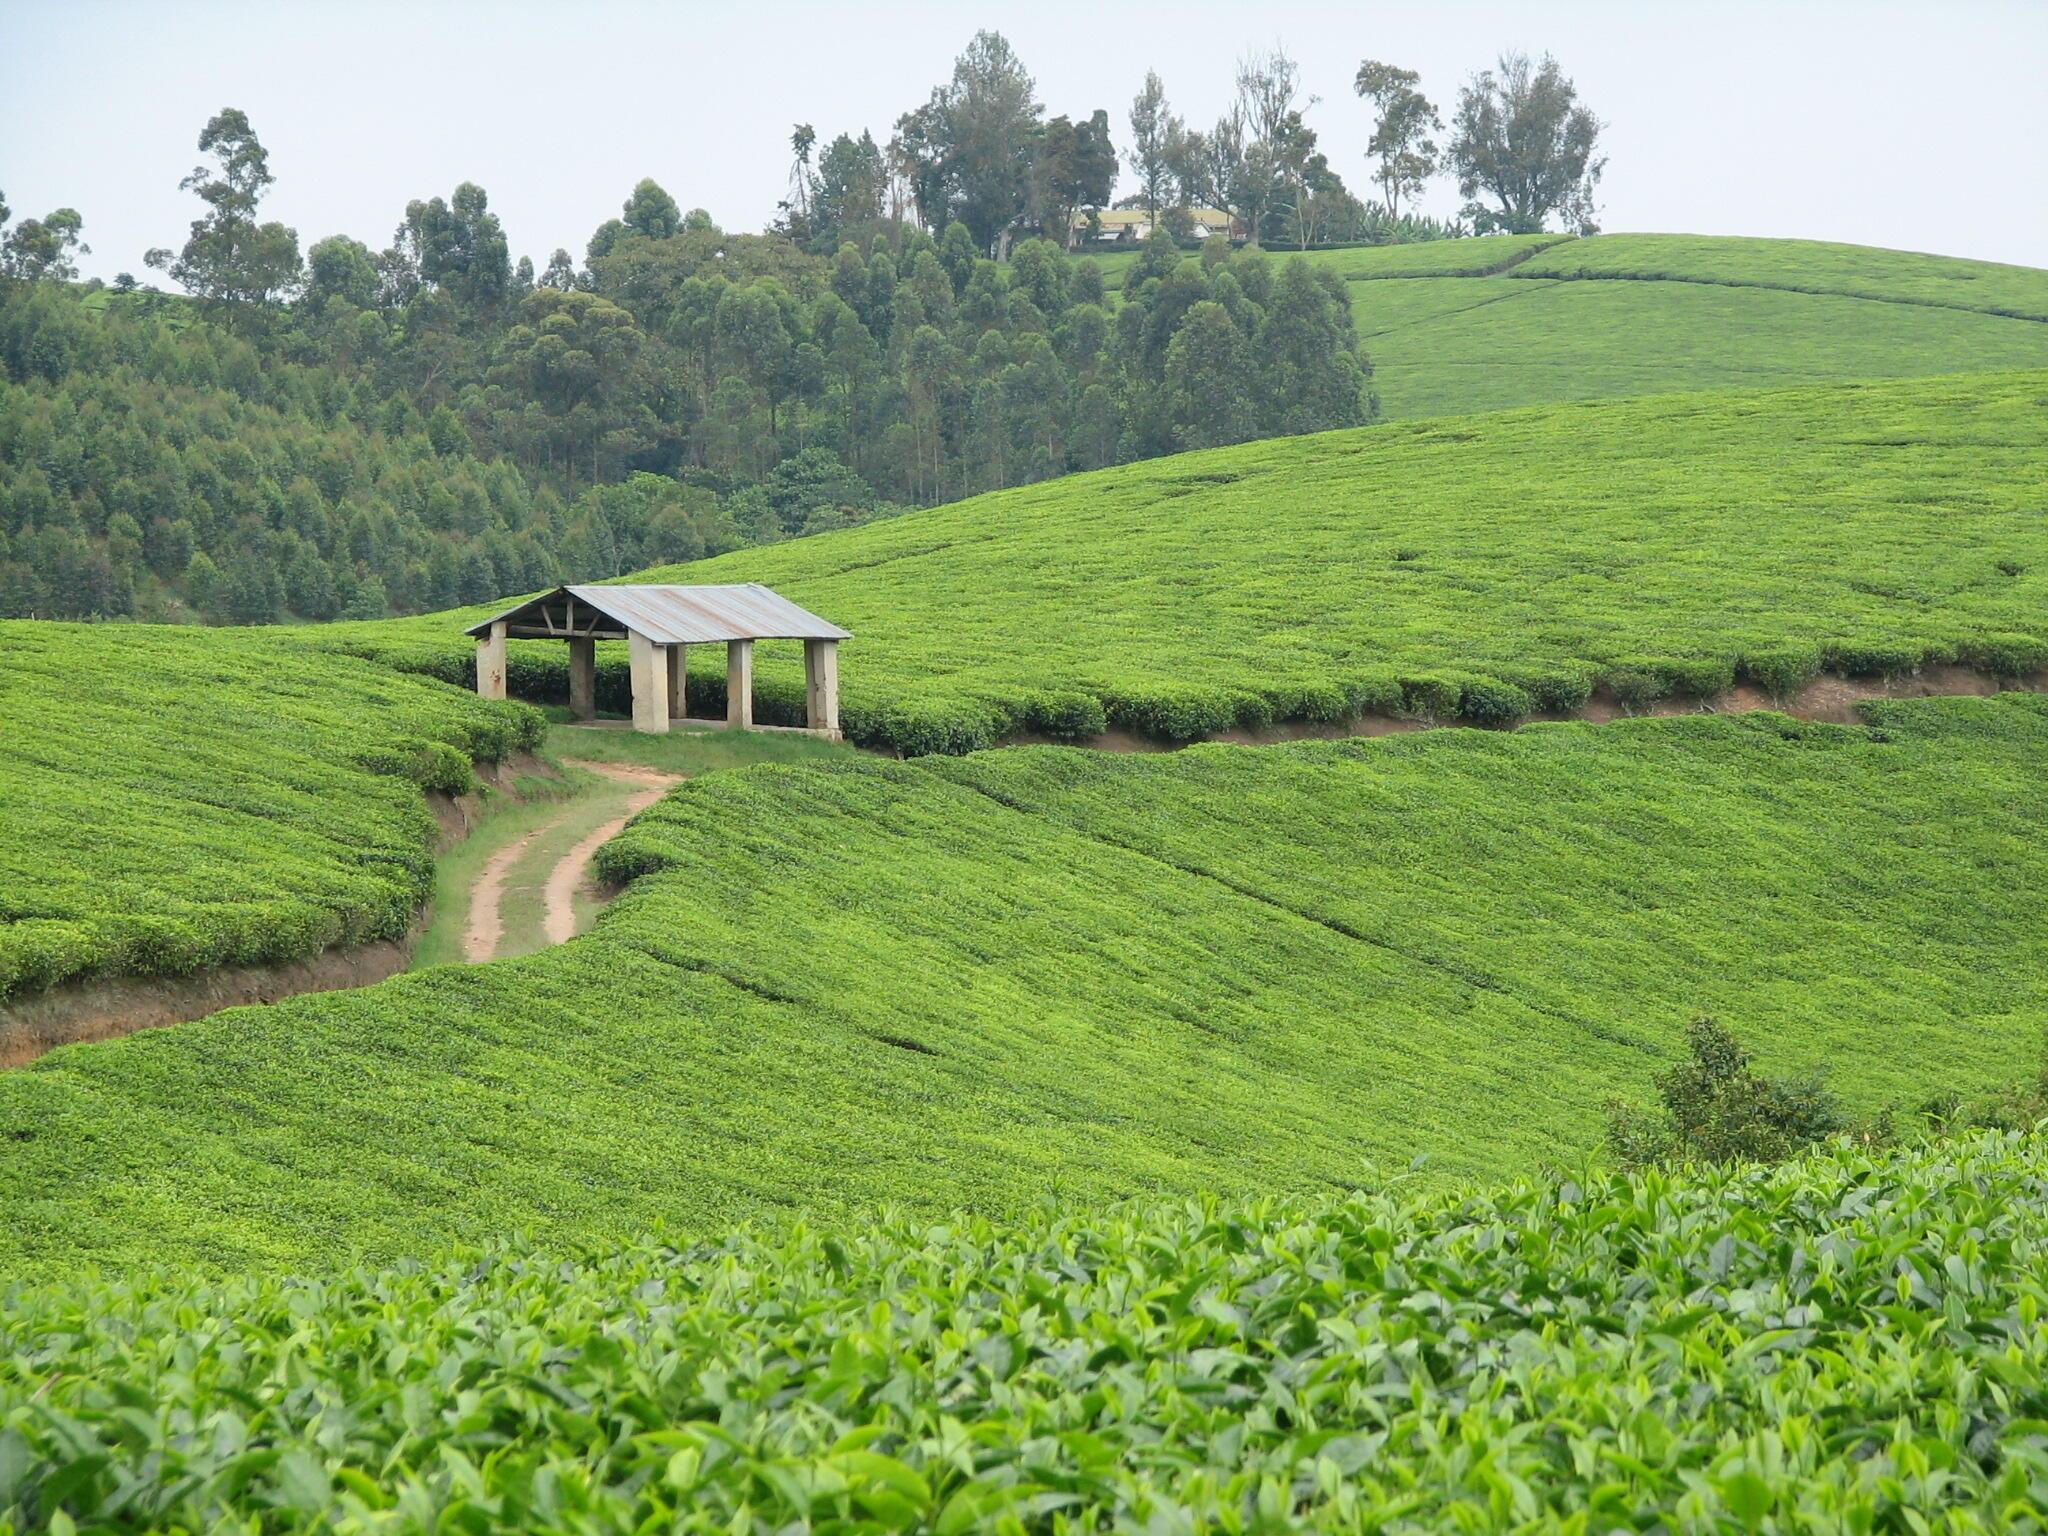 Tea plantations along the Mbarara-Kasese Road, Bushenyi District in Uganda.